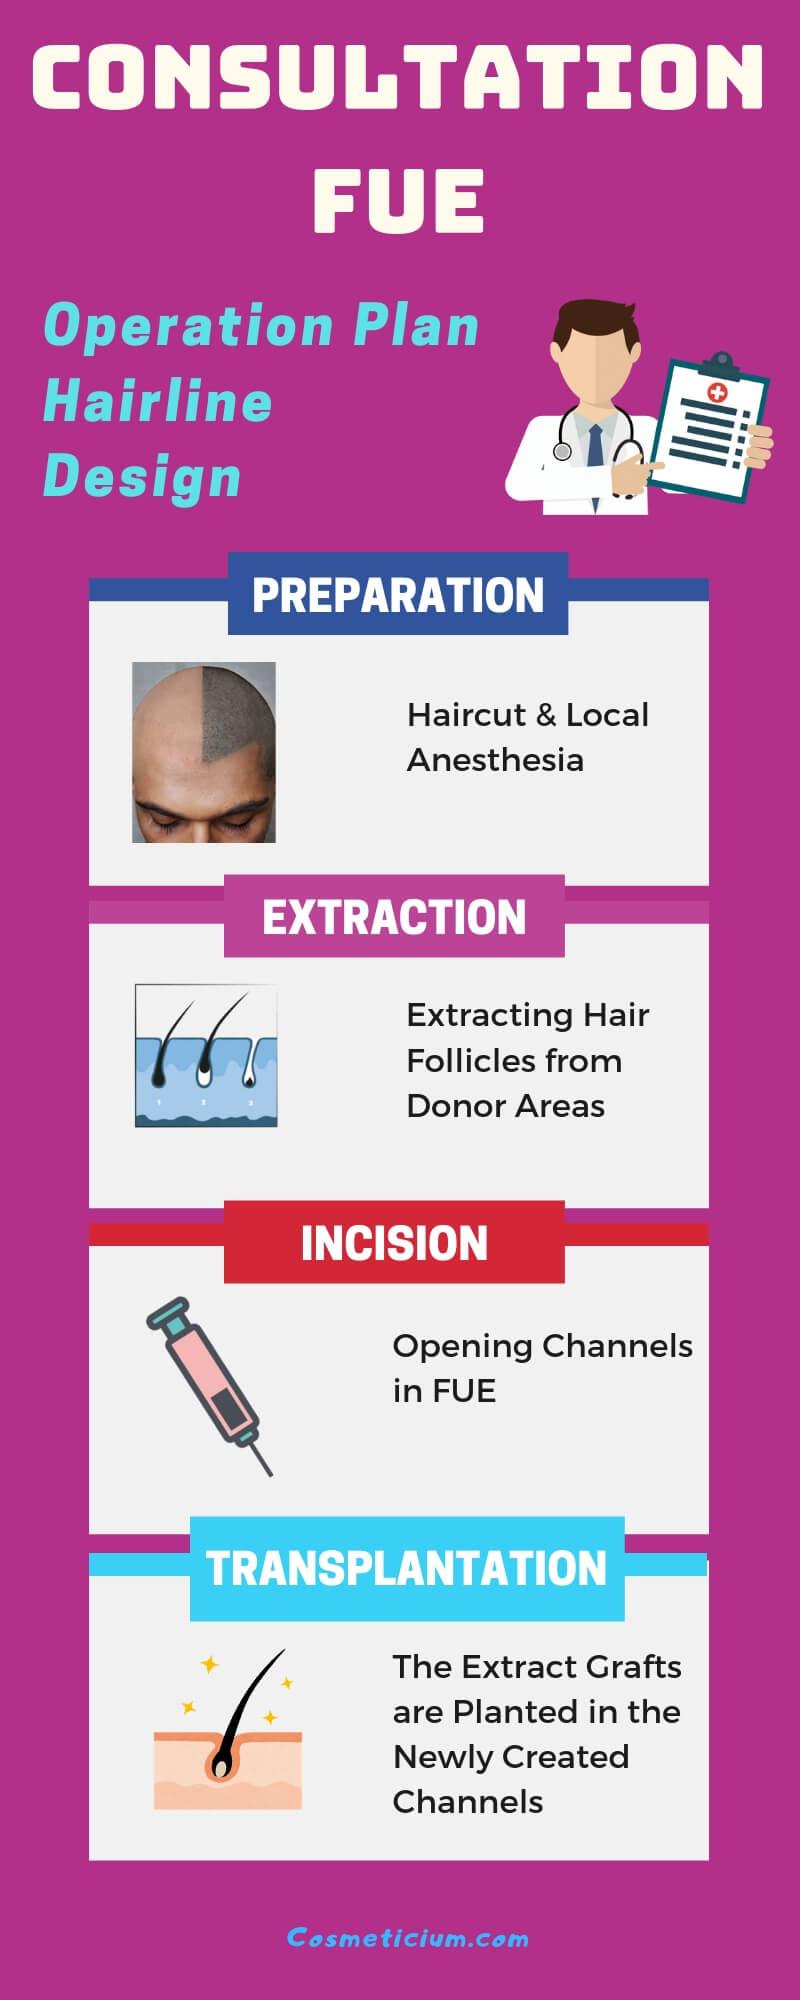 FUE Hair Transplantation Method